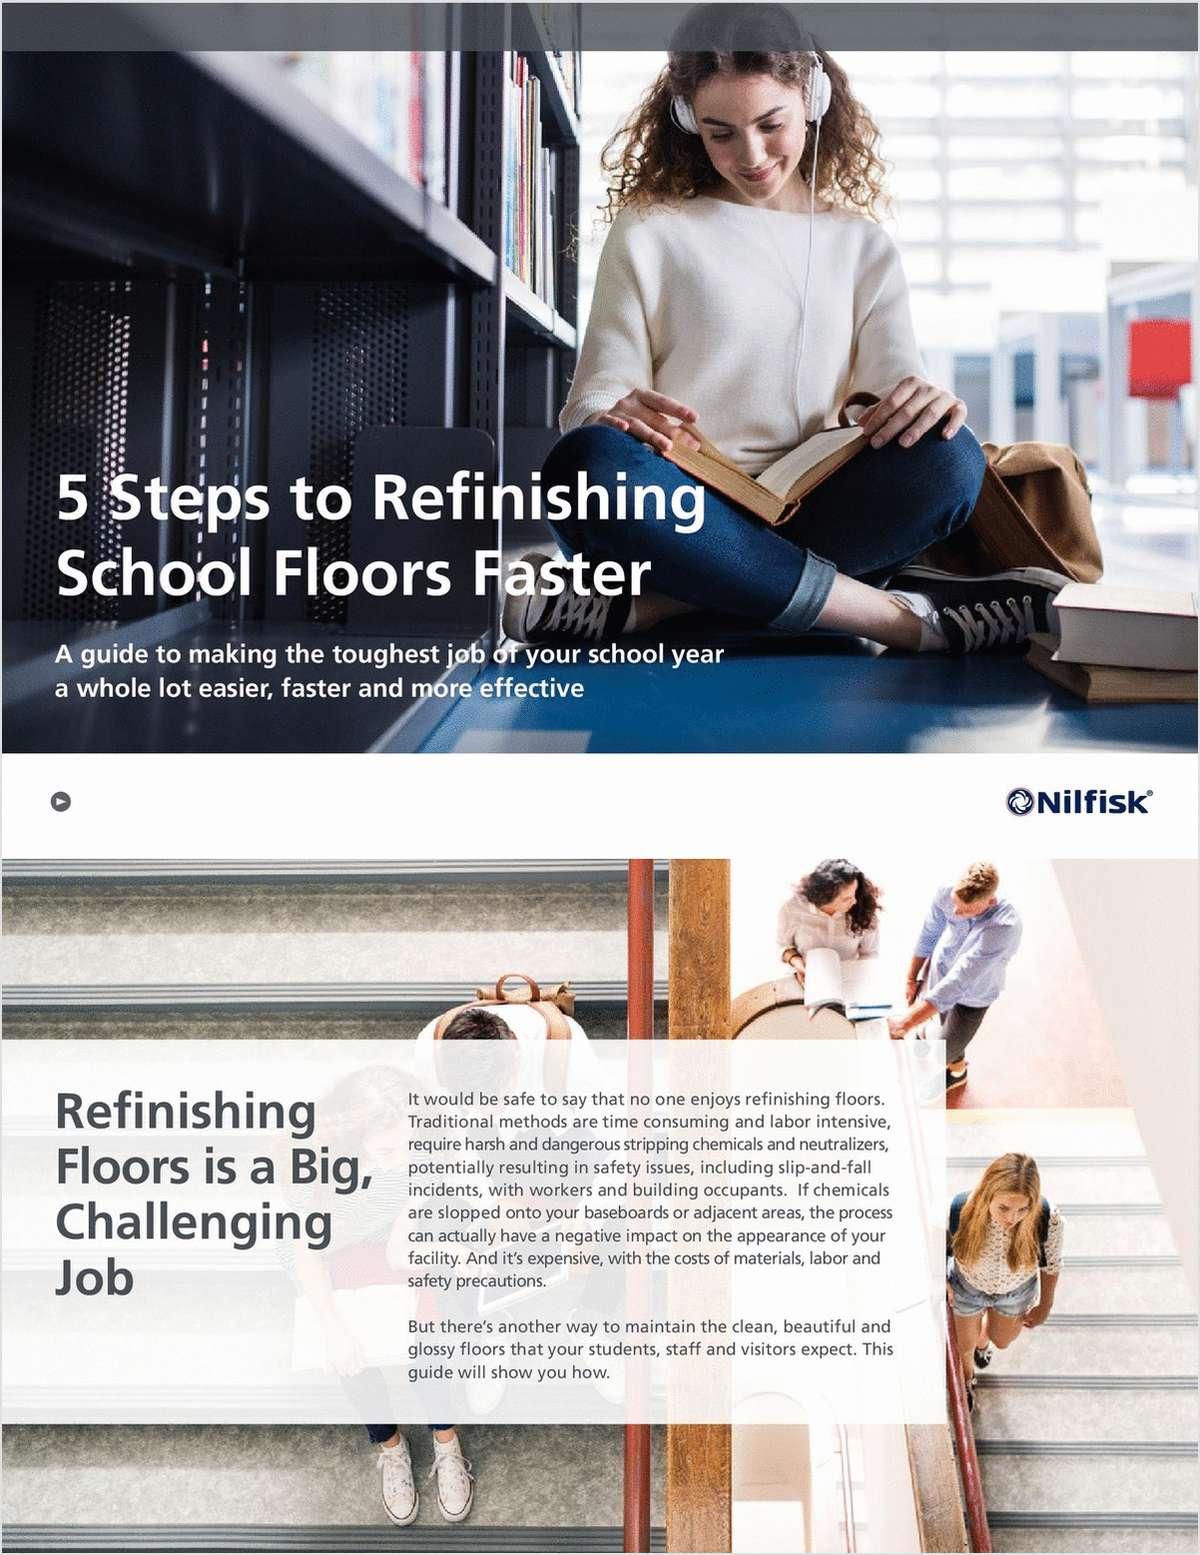 5 Steps to Refinishing School Floors Faster